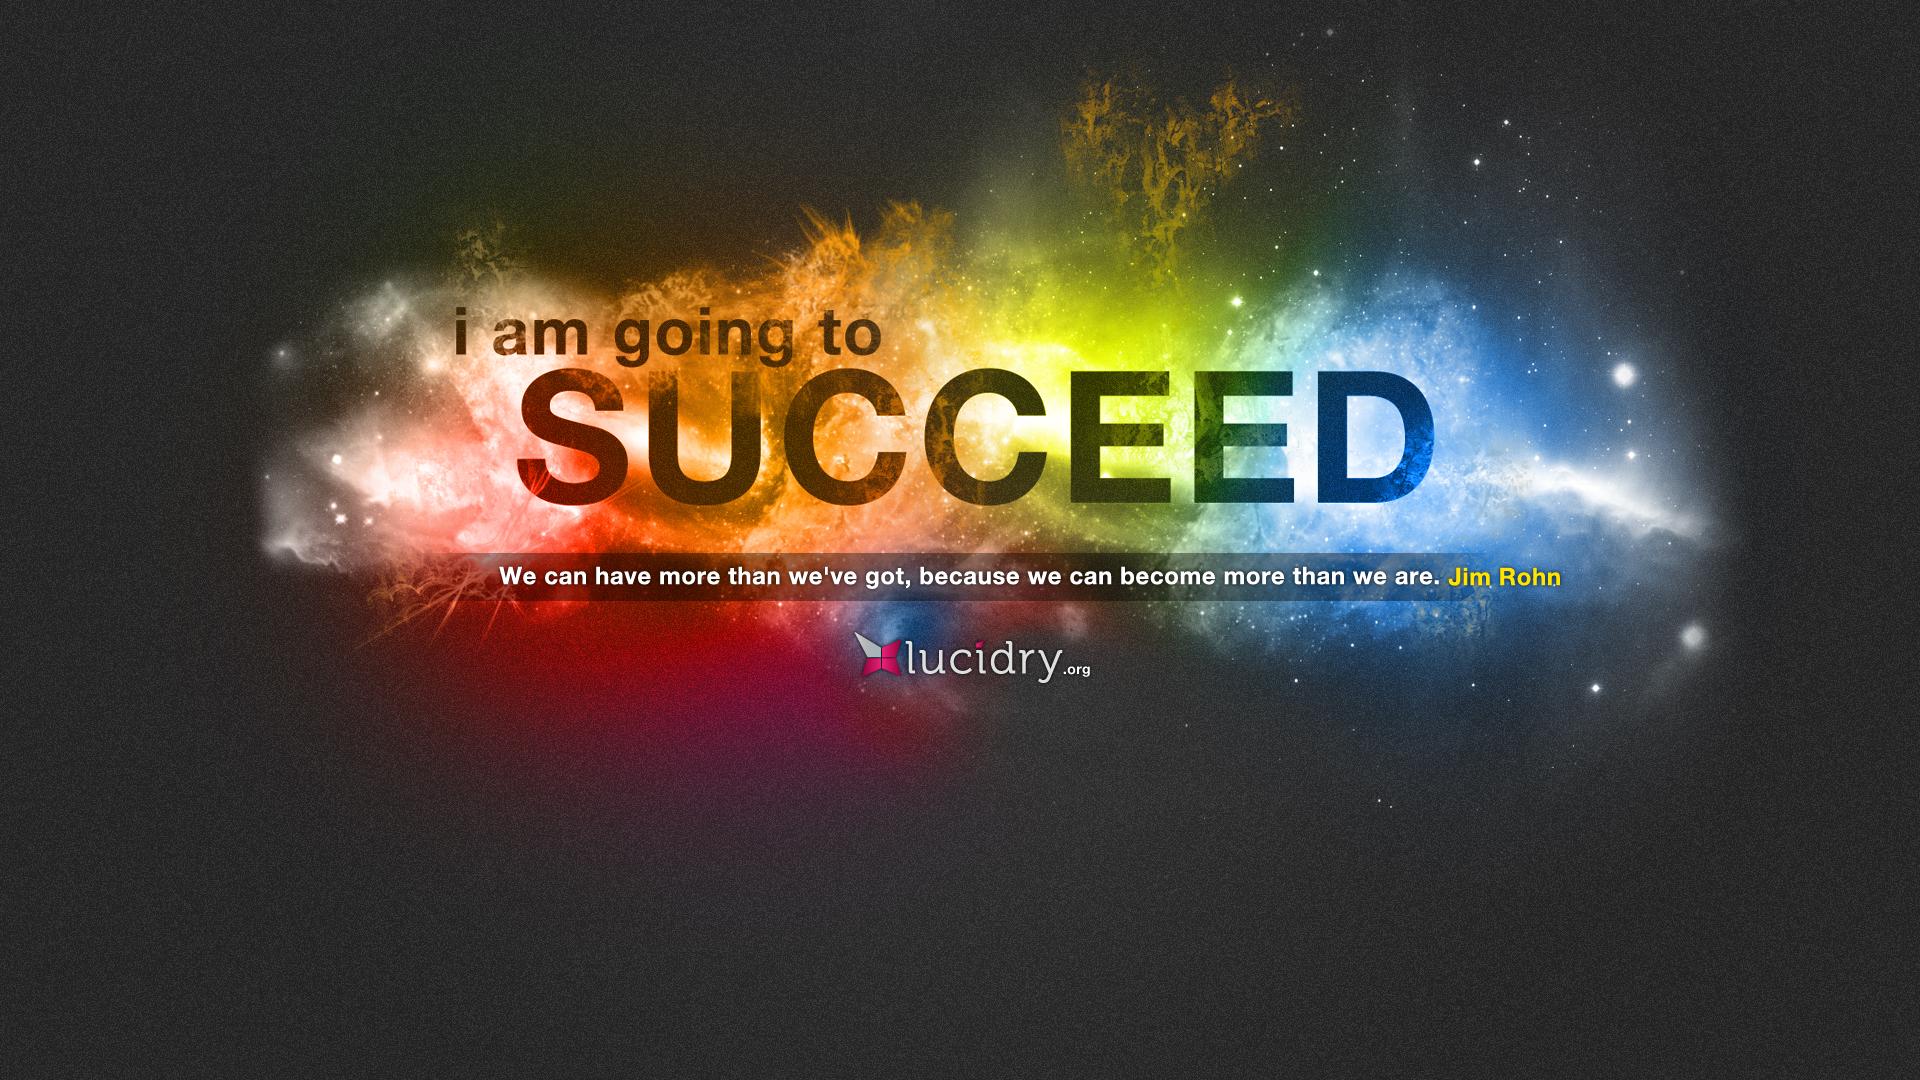 motivation free desktop backgrounds with succeed 1788715jpg 1920x1080